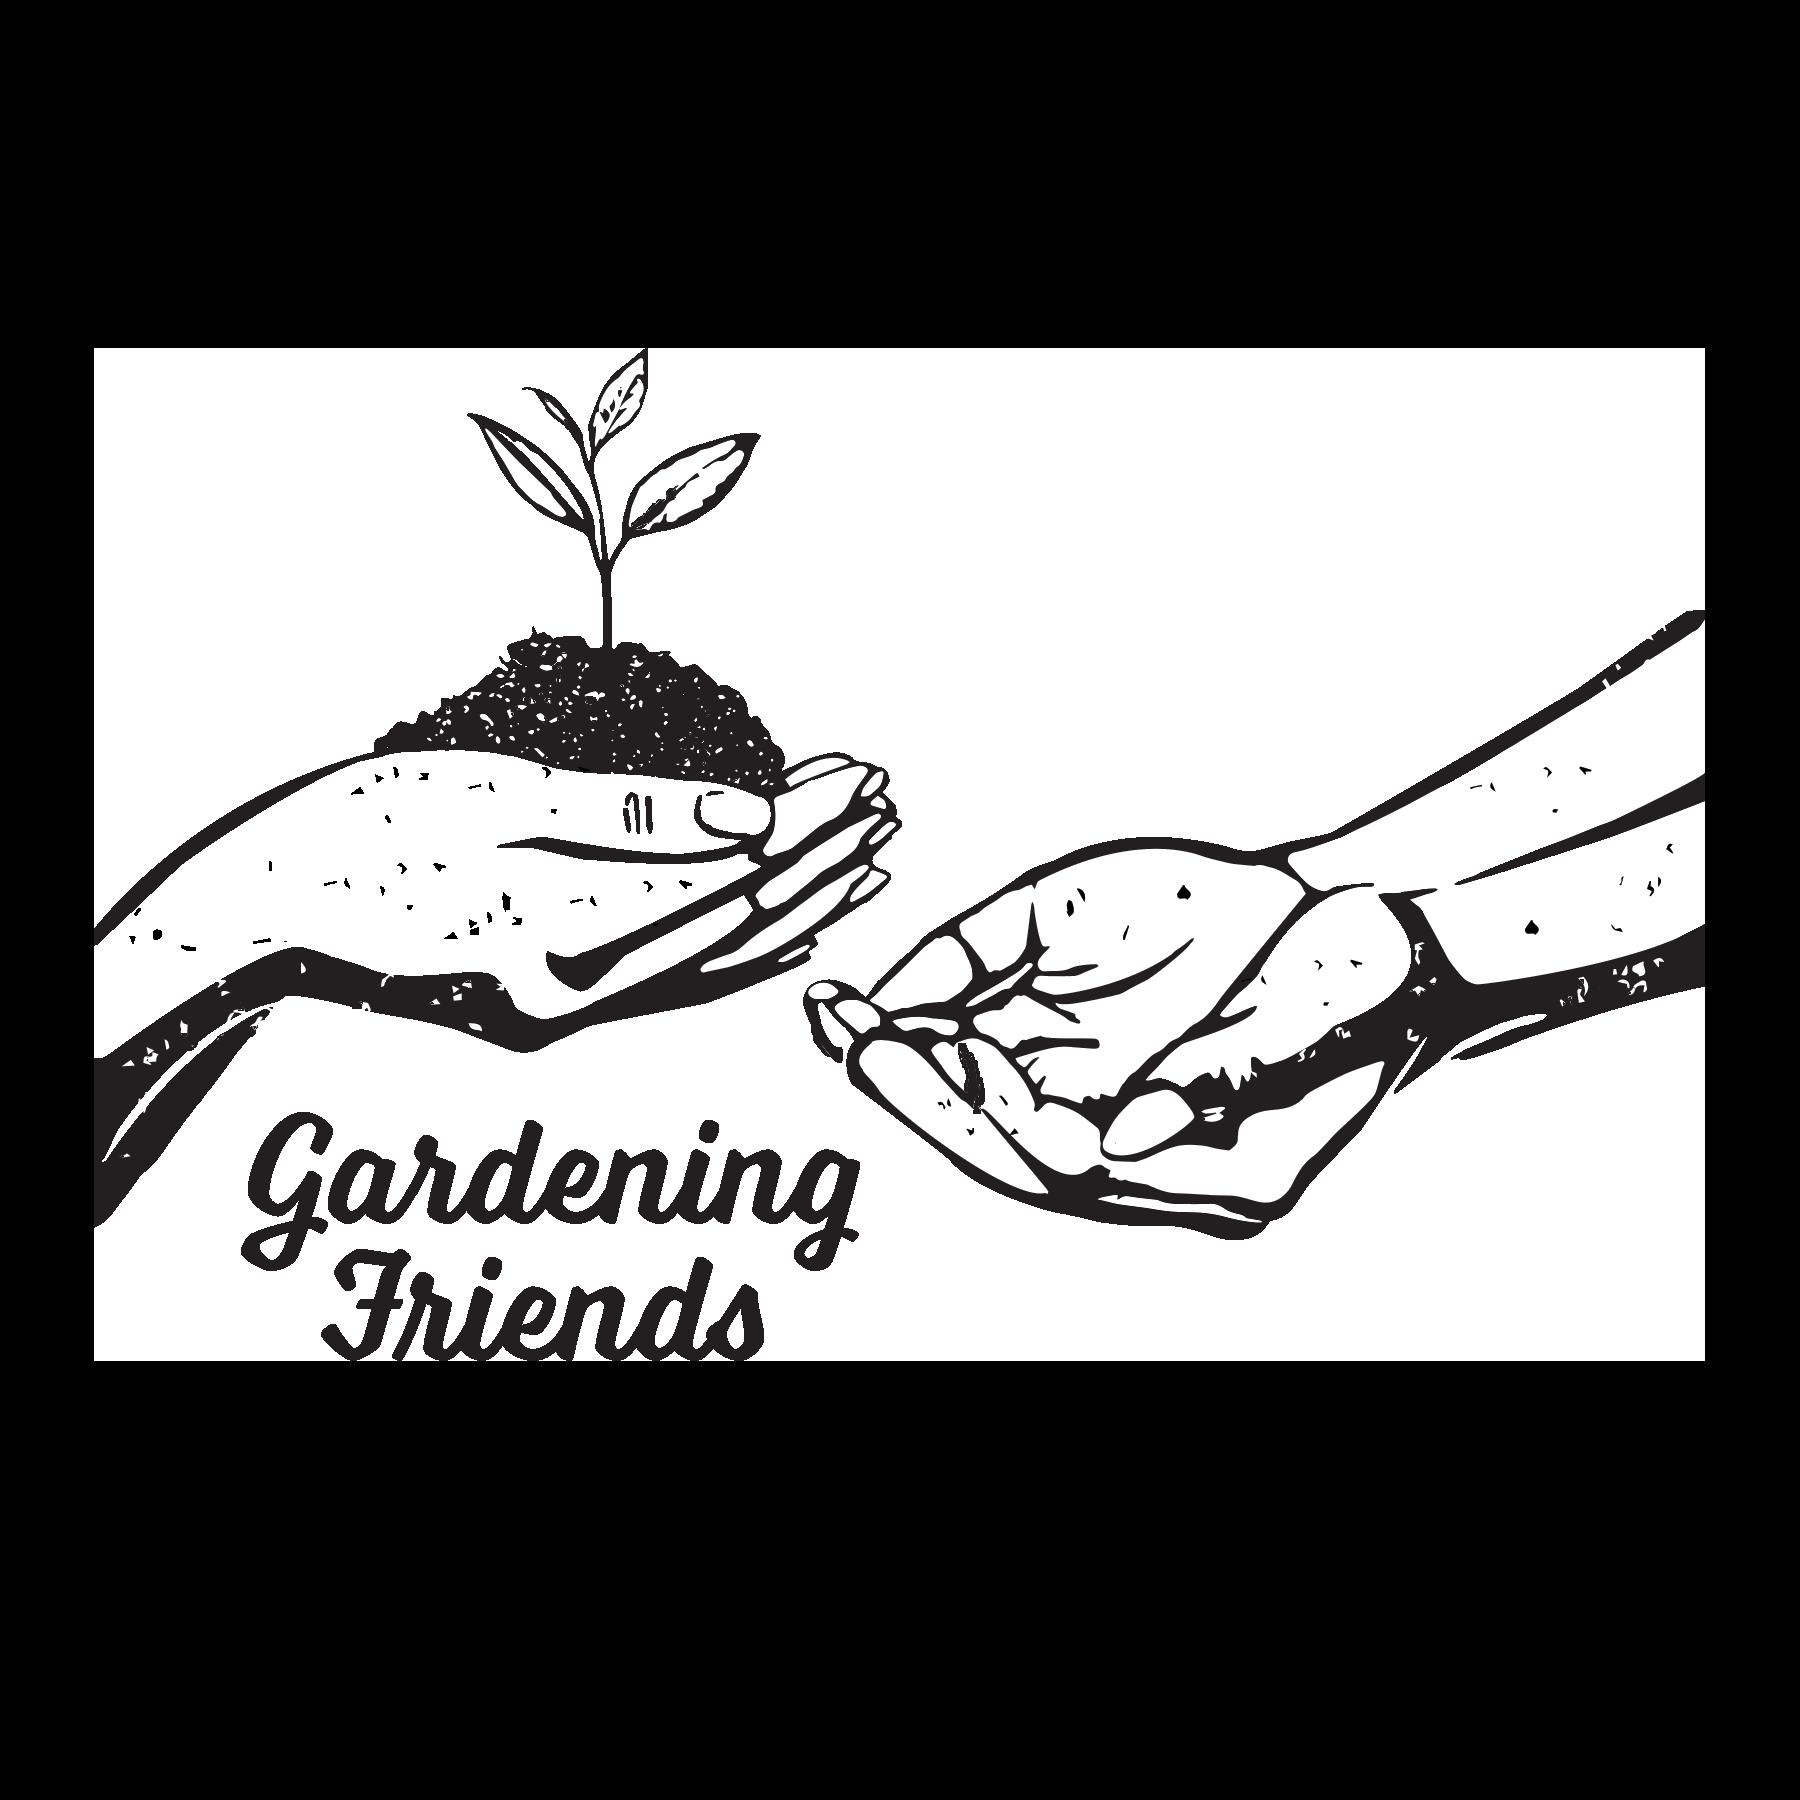 Gardening_Friends.png